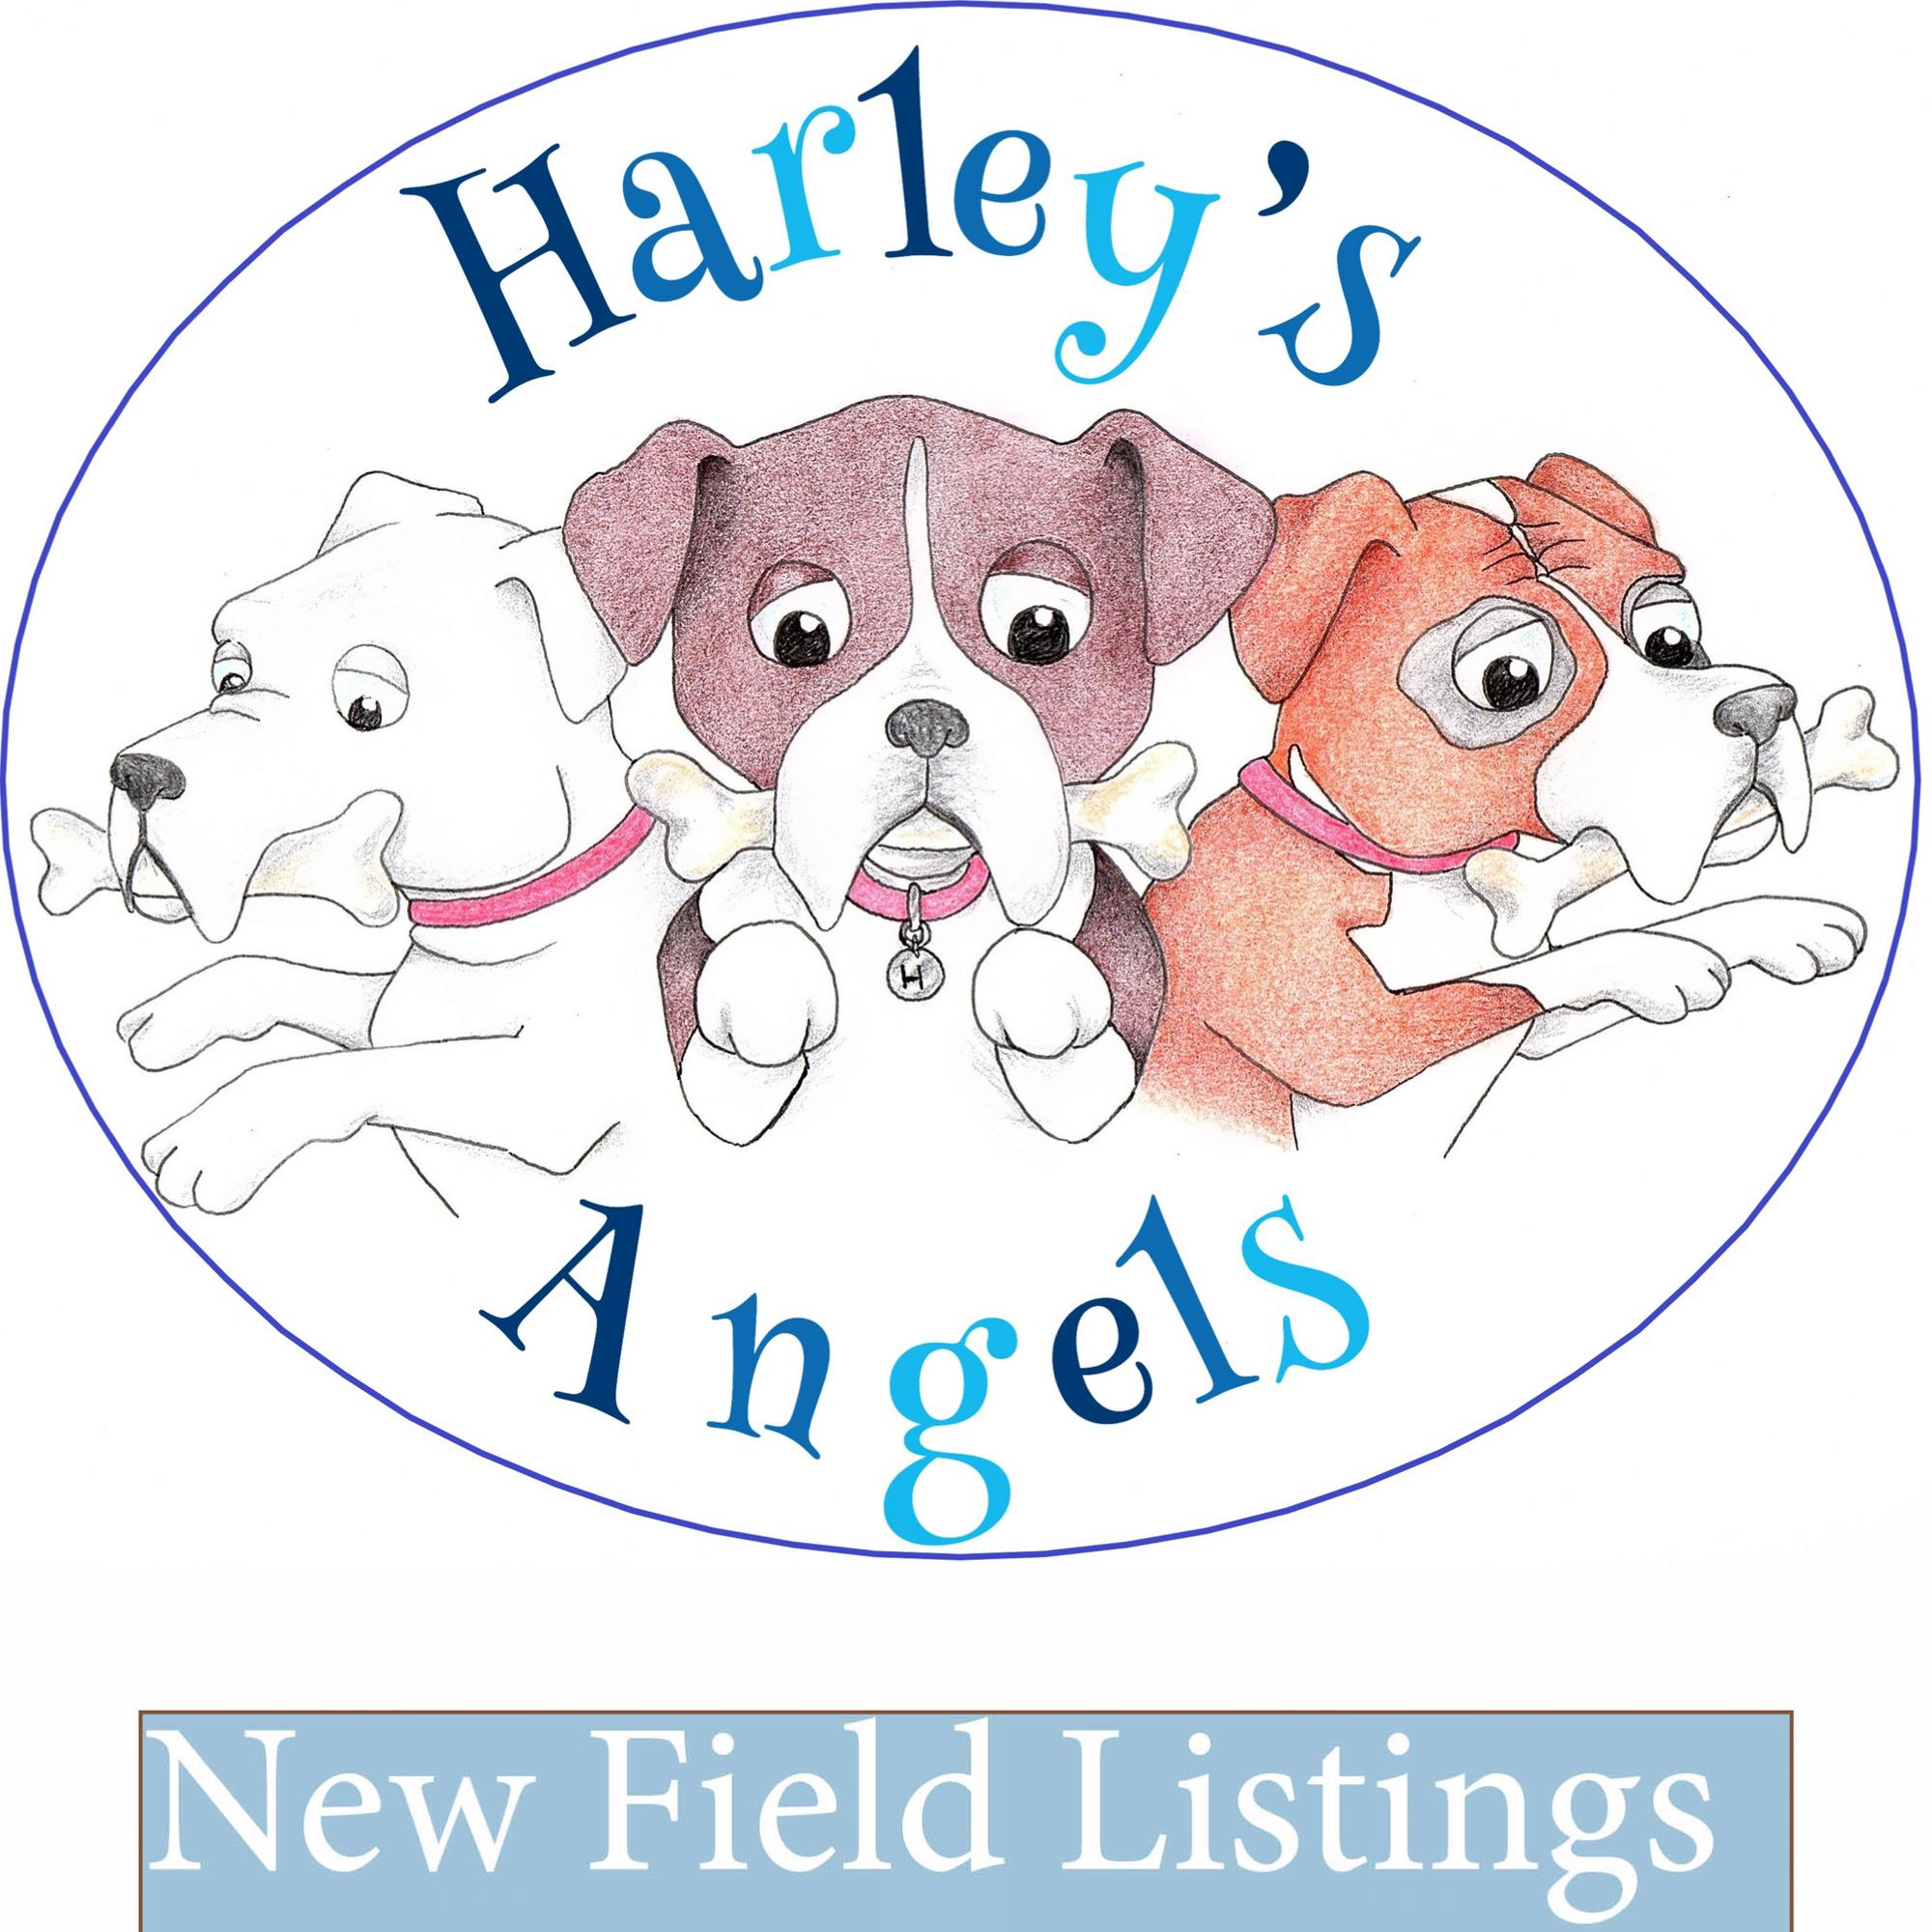 Harley S Angels Dog Park Greenhead Holding Stevenston North Ayrshire Ka20 4la Harley S Angels Is A Secure Dog Park Wher Dog Play Area Dog Walking Dog Park